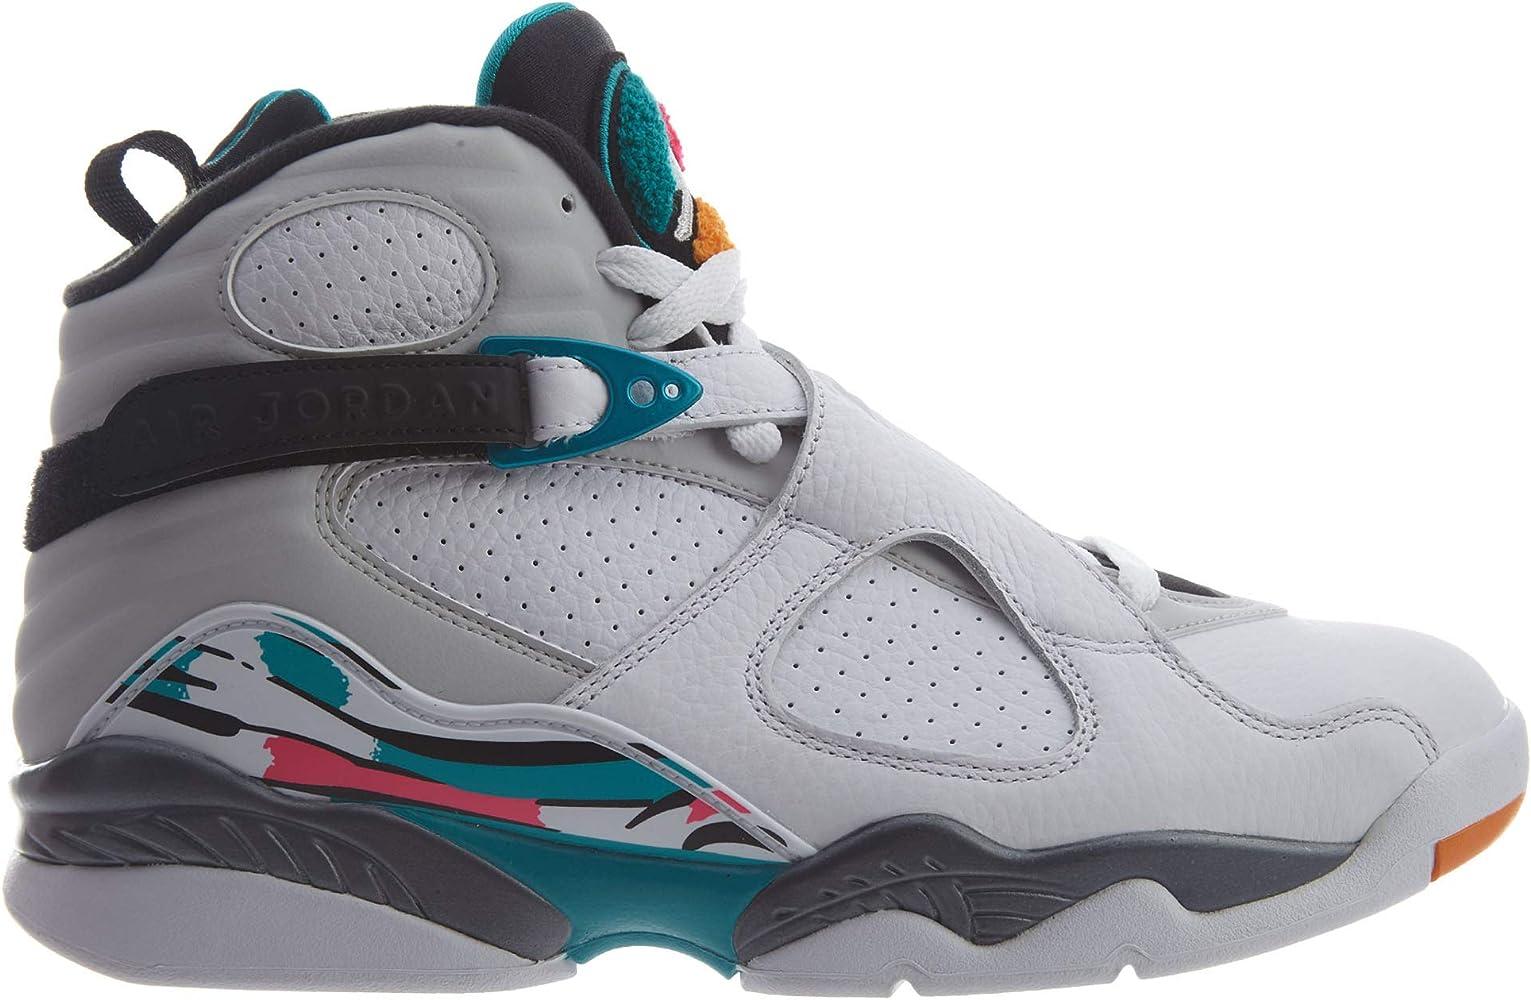 0c80d1a6aa9 Amazon.com | Nike AIR Jordan 8 Retro South Beach 305381-113 (11.5 ...